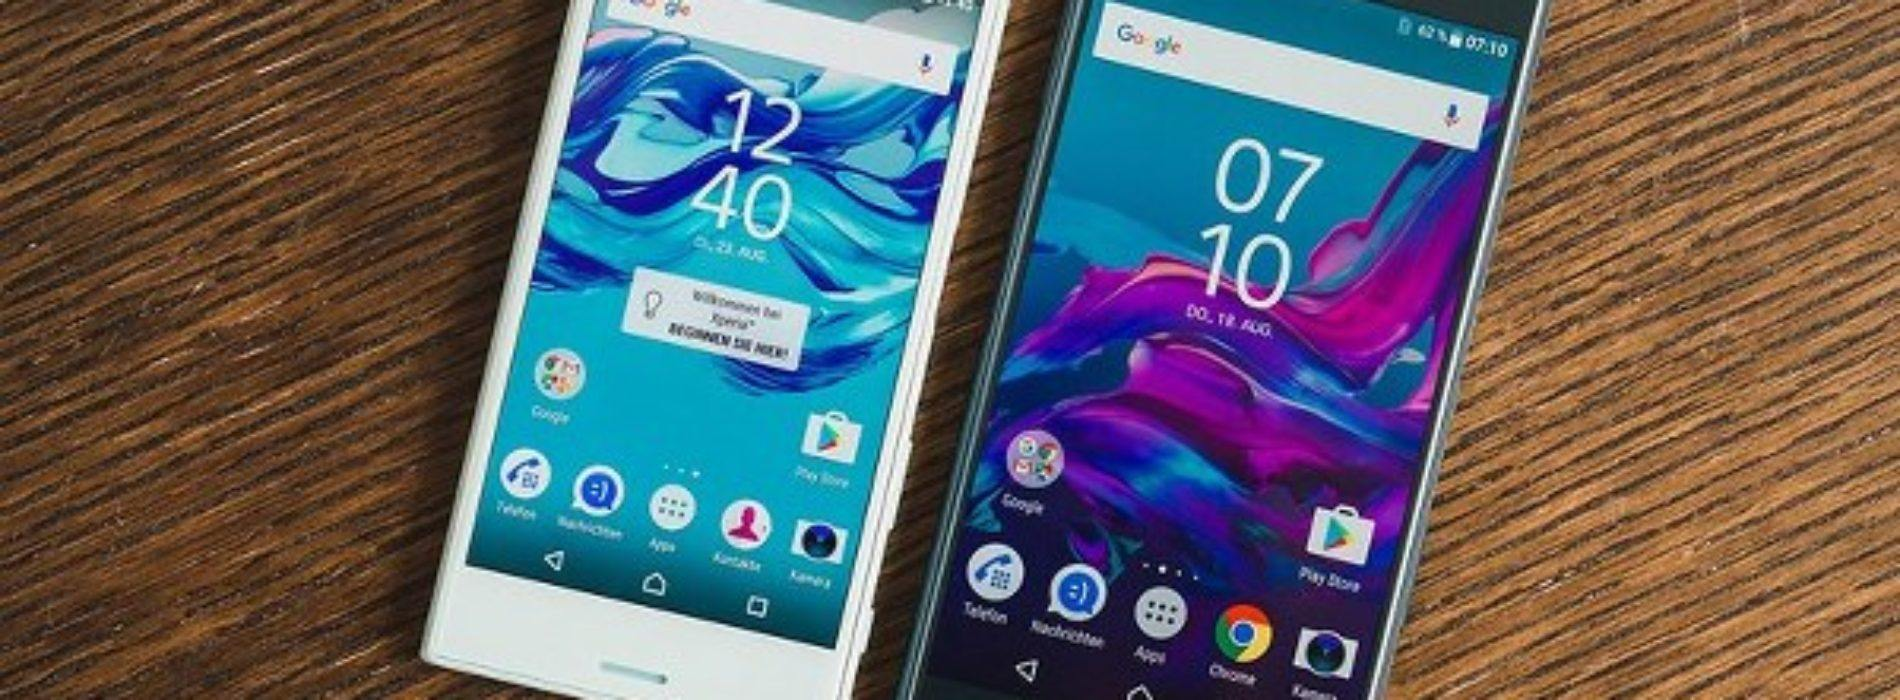 Xperia X Compact: Un buen smartphone de Sony